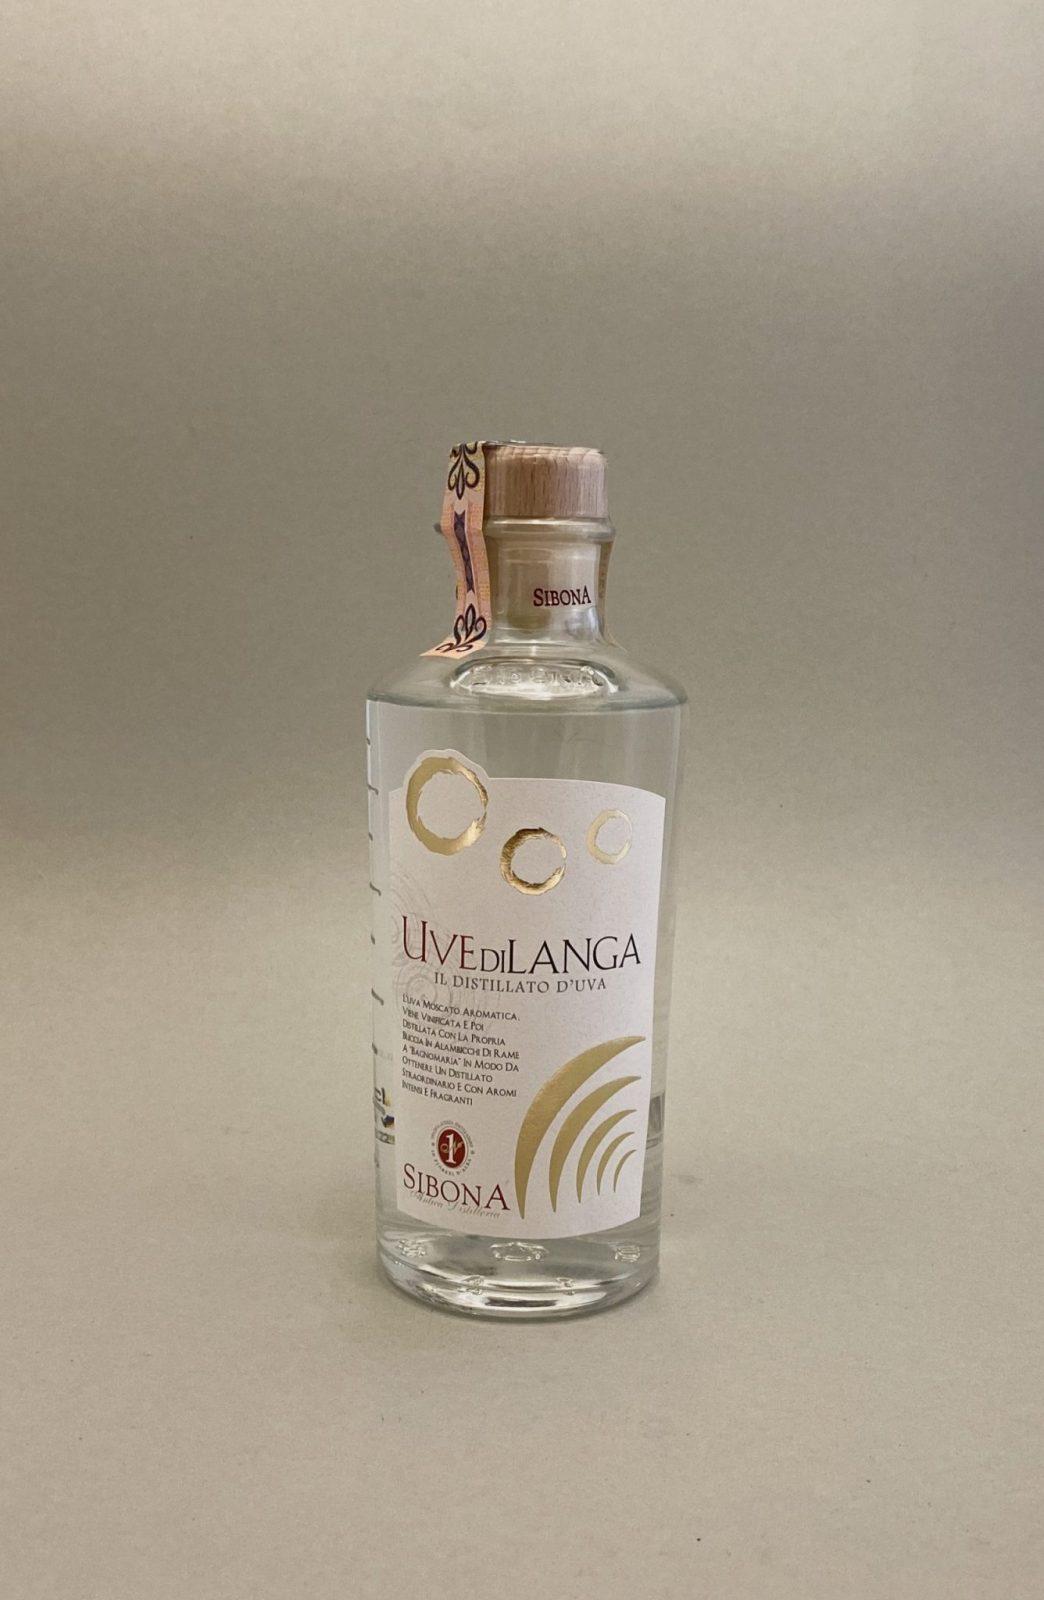 Grappa Sibona Uvedilanga 40%, Bottleshop Sunny wines slnecnice mesto, petrzalka, Brandy, rozvoz alkoholu, eshop